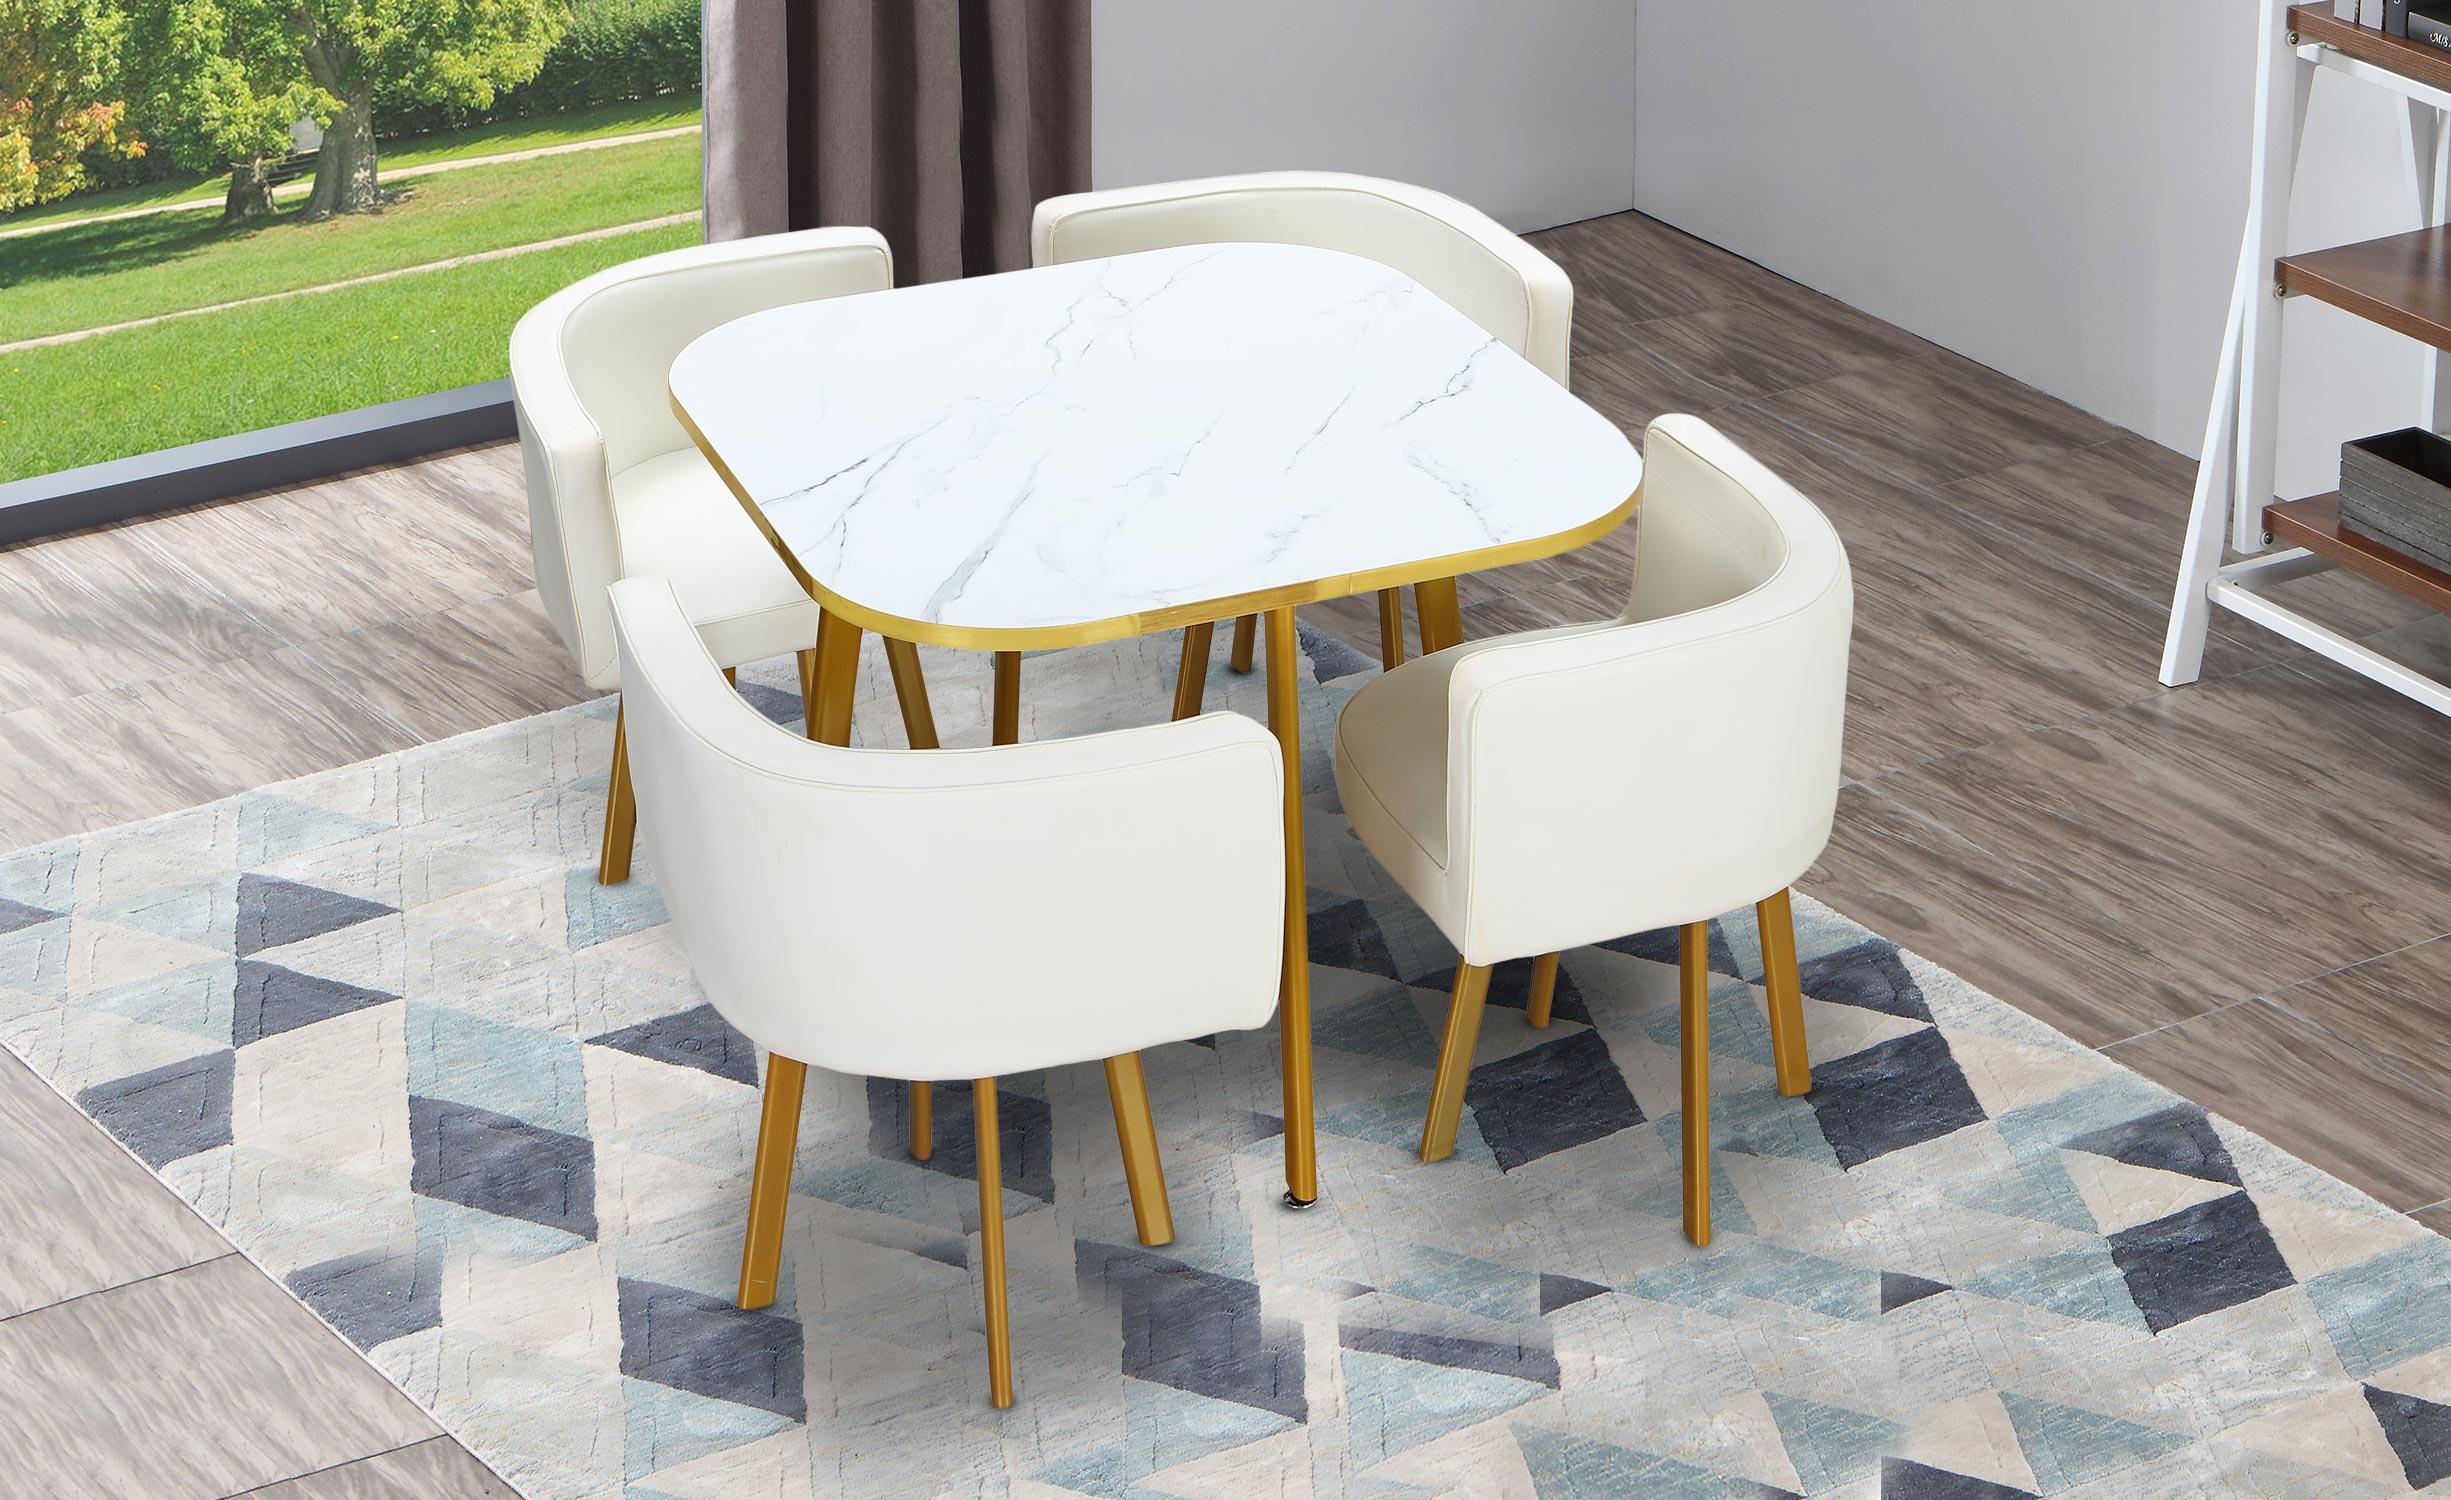 Oslo goudkleurig marmereffect en witte simili tafel en stoelen